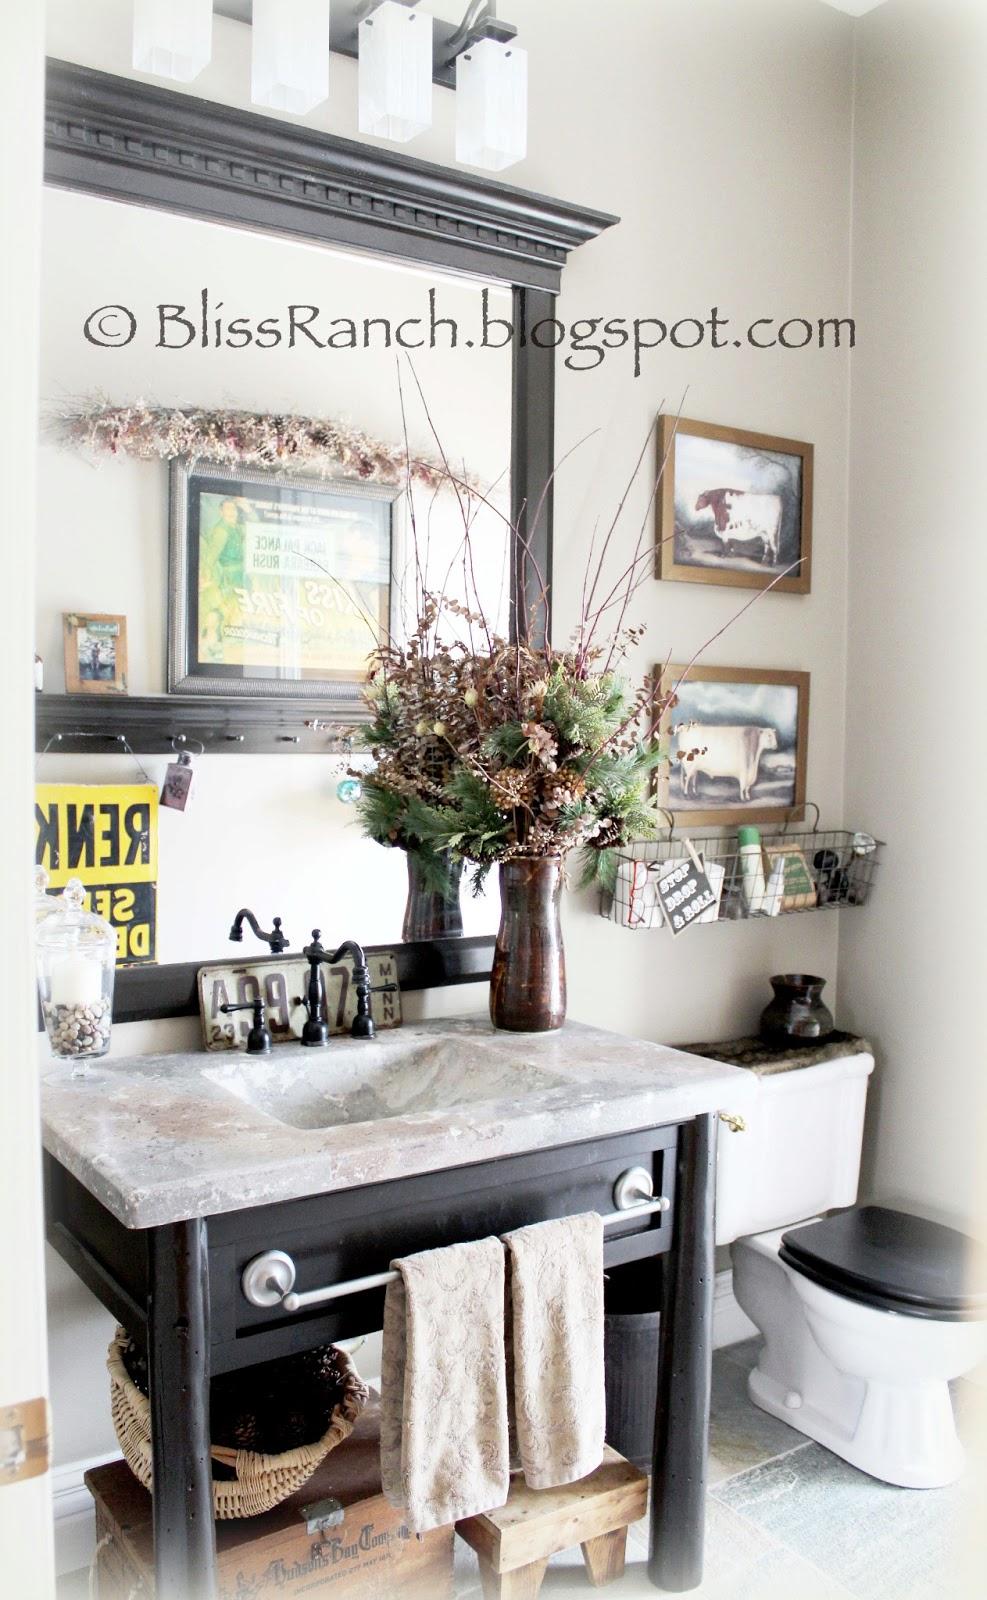 Bliss ranch avoiding my dining room redo with a bathroom tour for Megan u bathroom tour